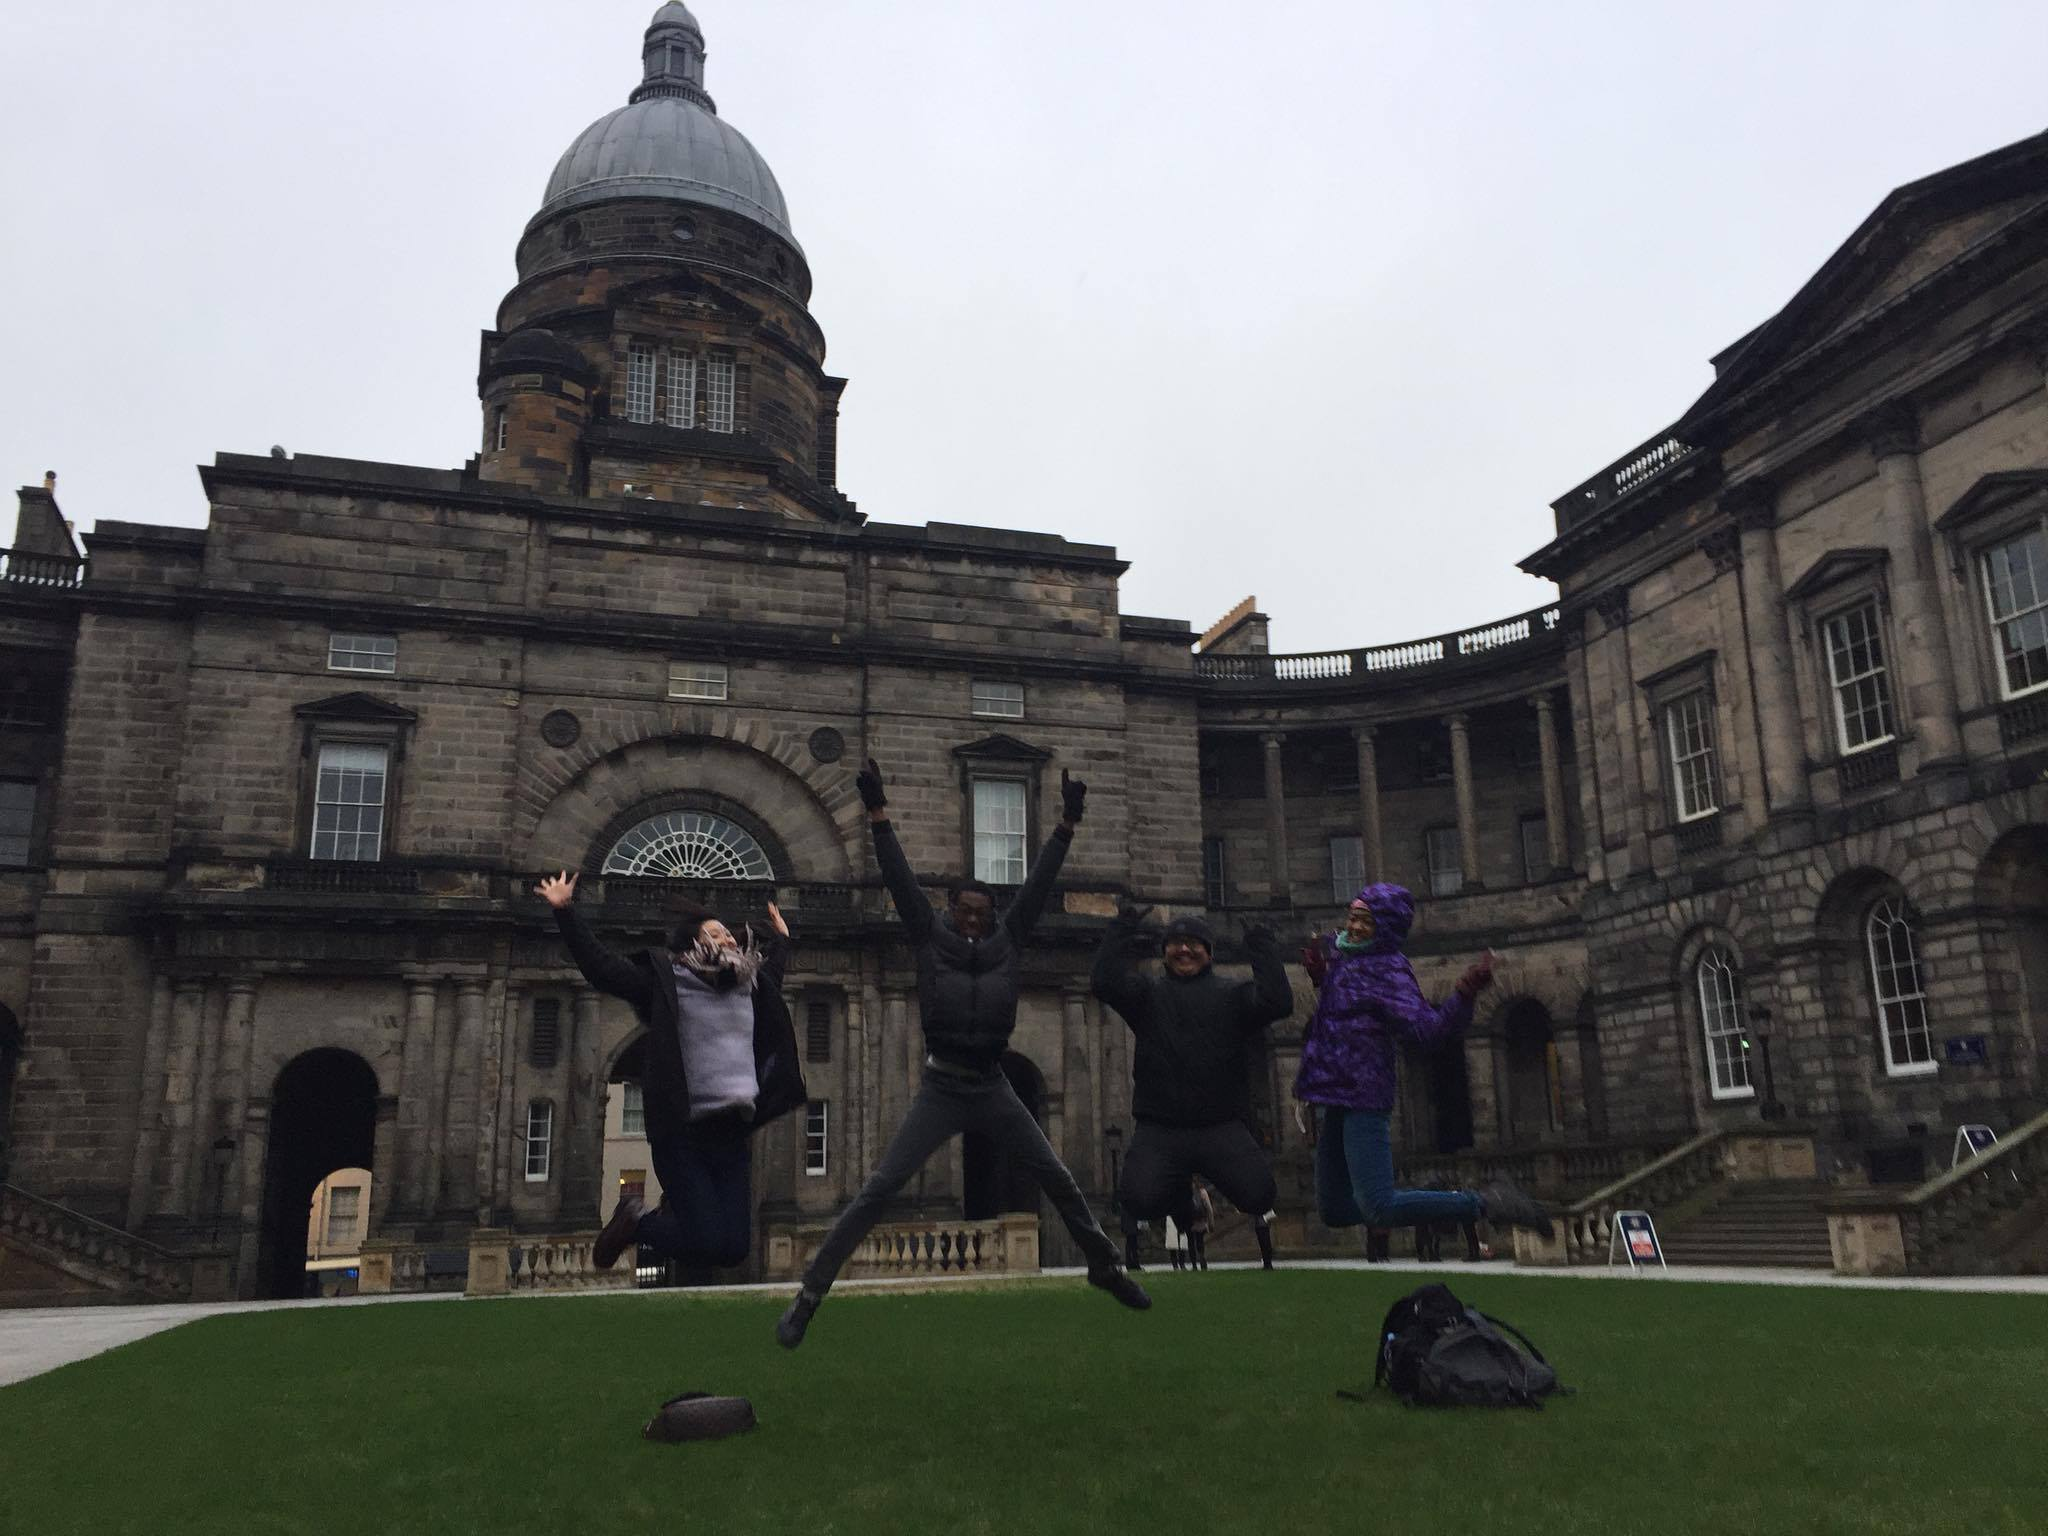 celebration-after-volunteer-event-in-edinburgh-scotland